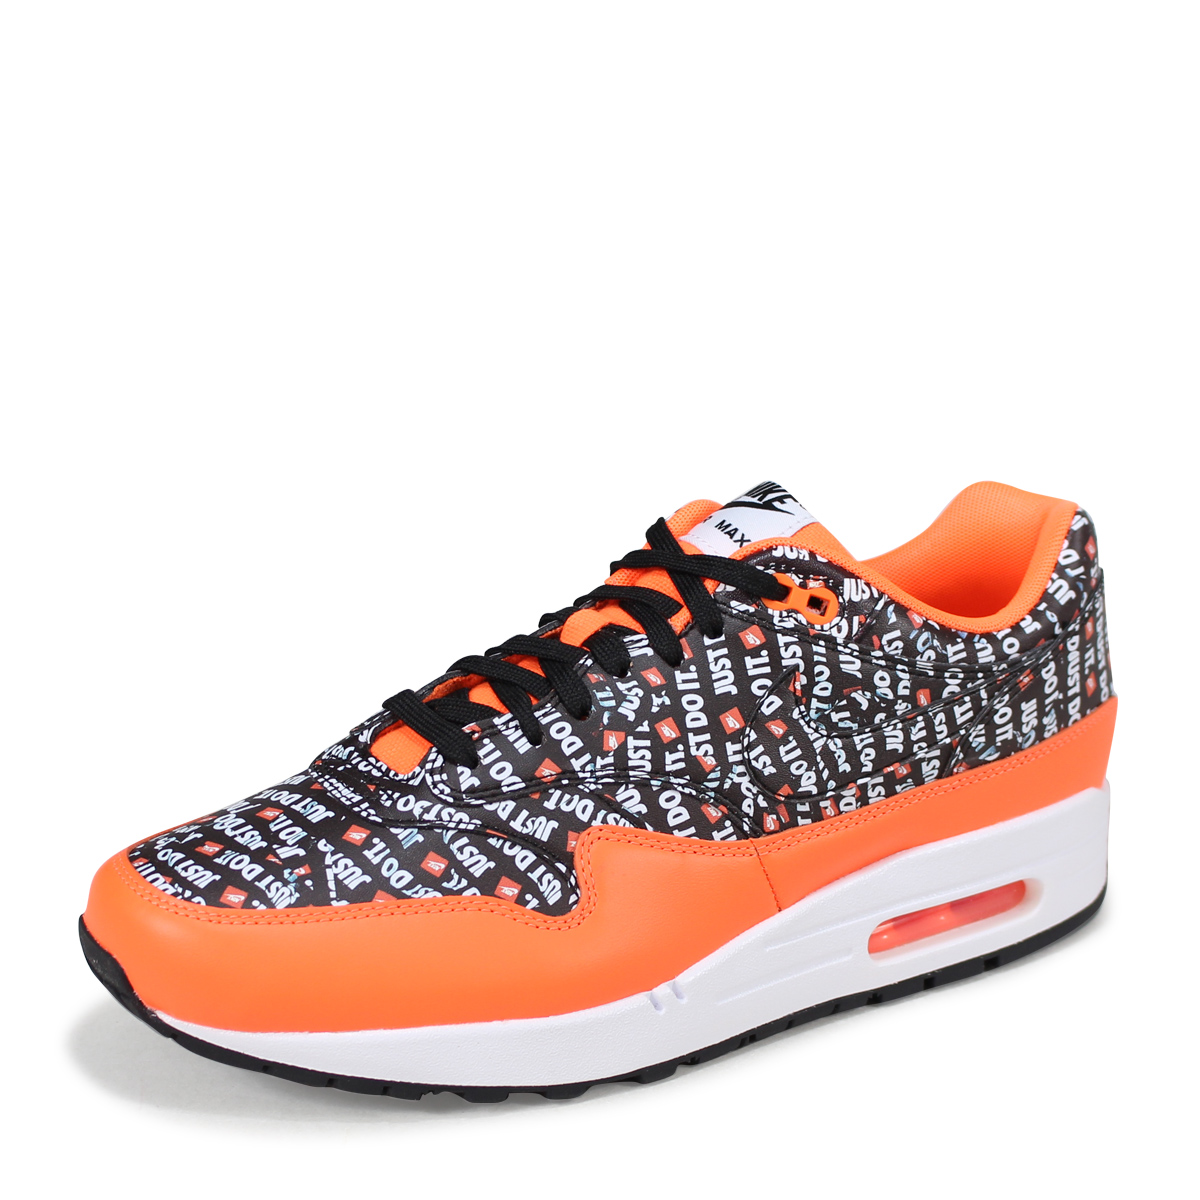 separation shoes 0d2b3 7f4ee ALLSPORTS  Nike NIKE Air Max 1 premium sneakers men AIR MAX 1 PREMIUM  875,844-008 orange  the 4 3 additional arrival   193    Rakuten Global  Market